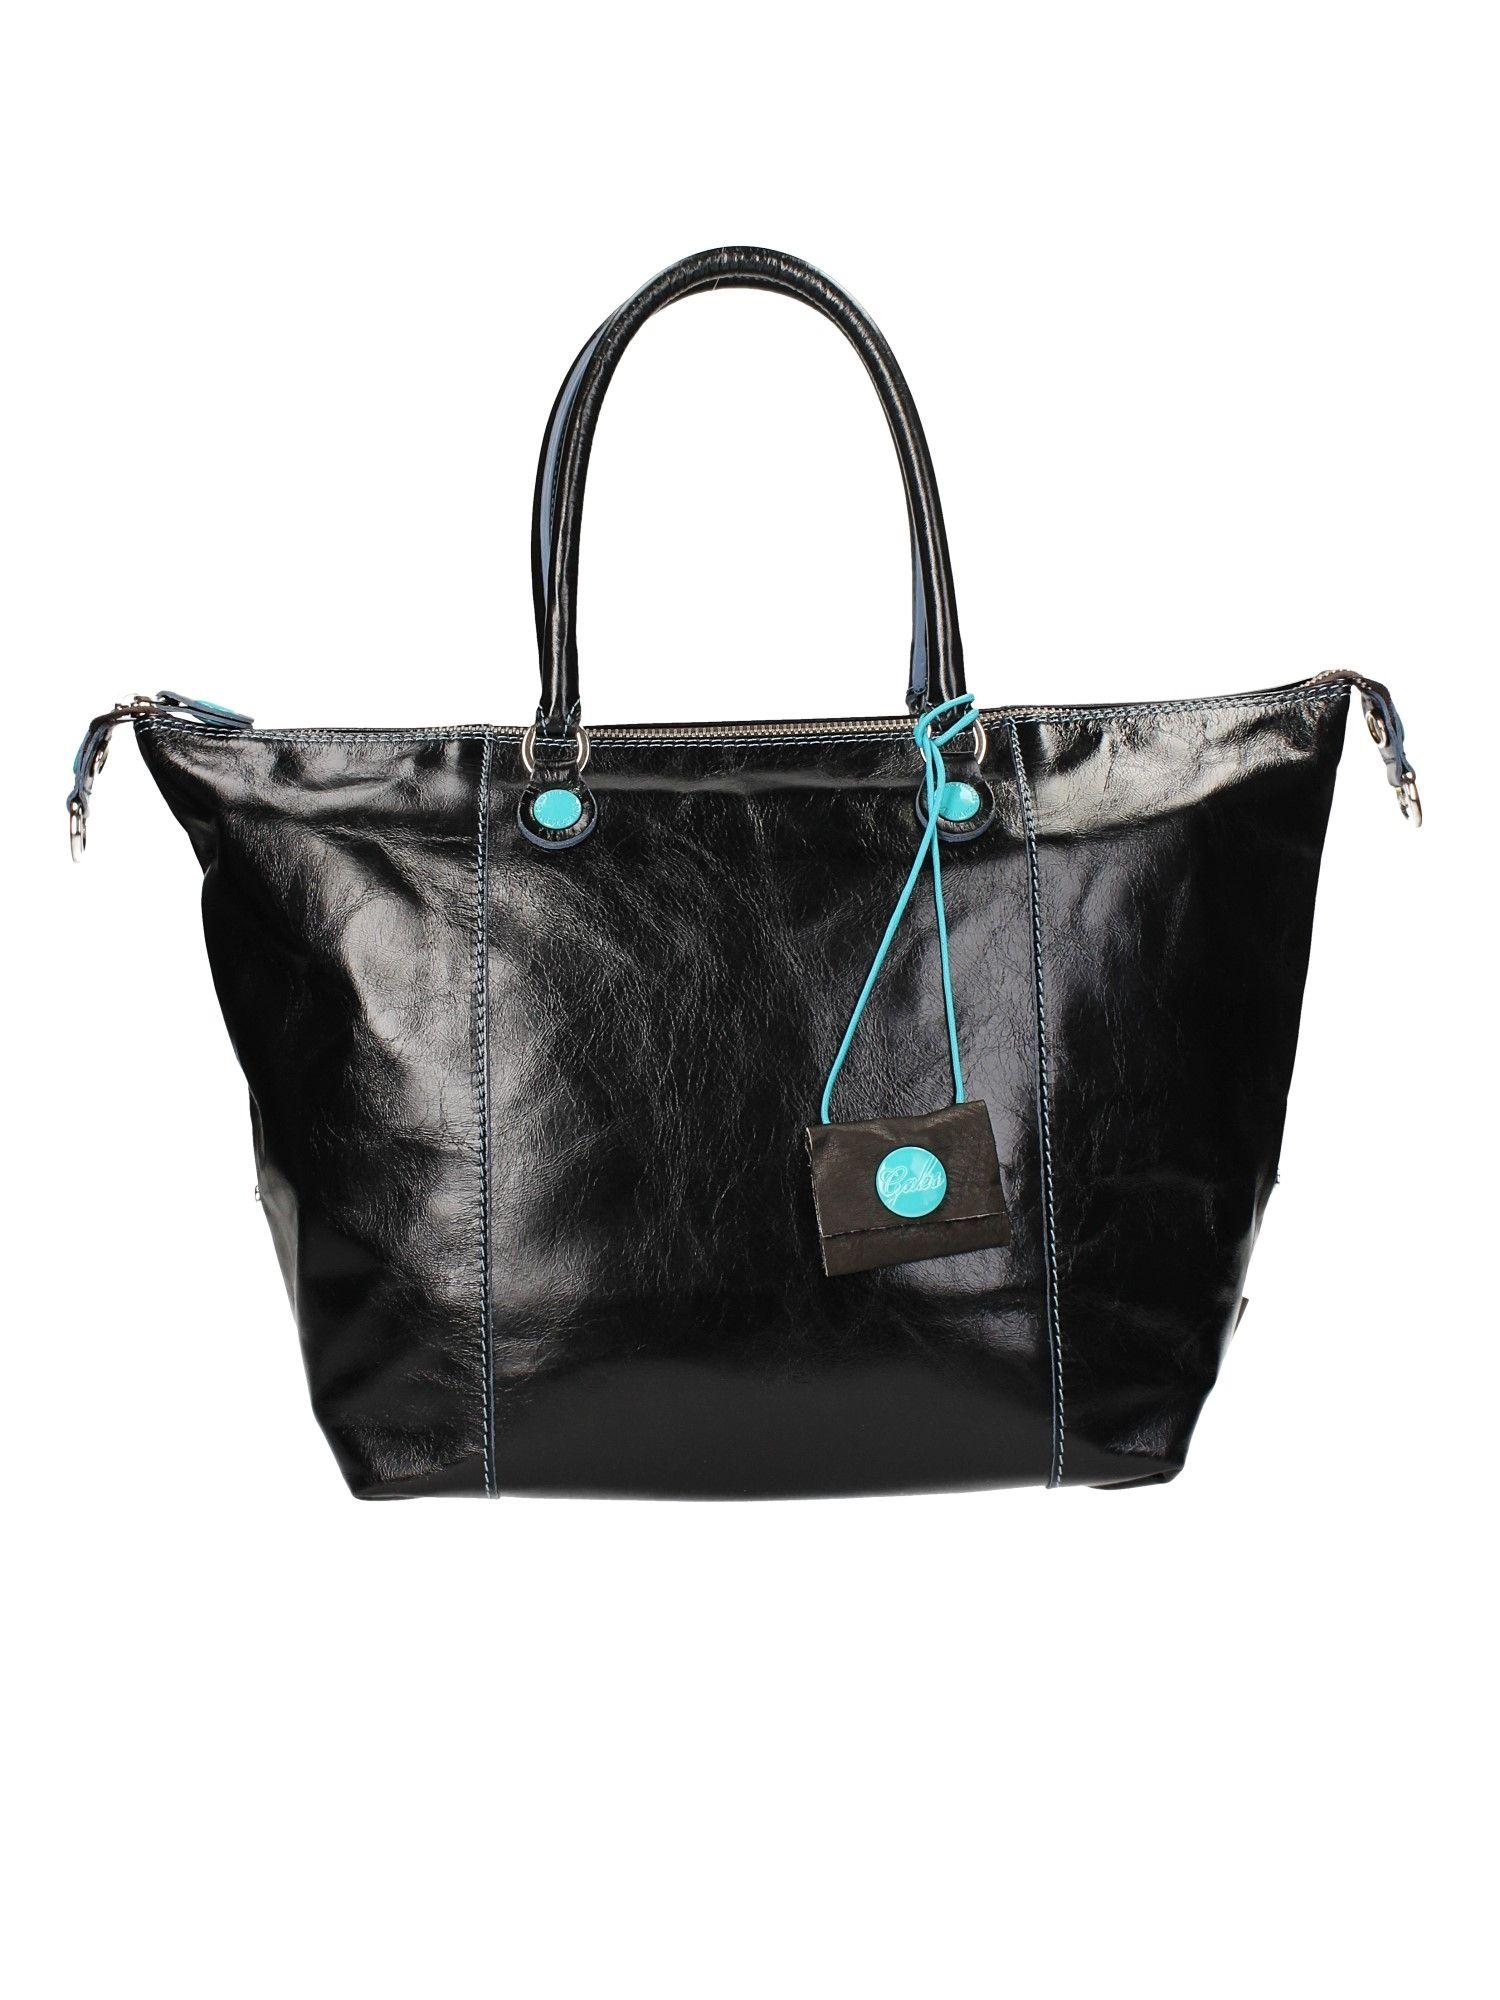 Pinterest Bag Teria Shopping Gabs Black U5Znw 6be7eb71e2b